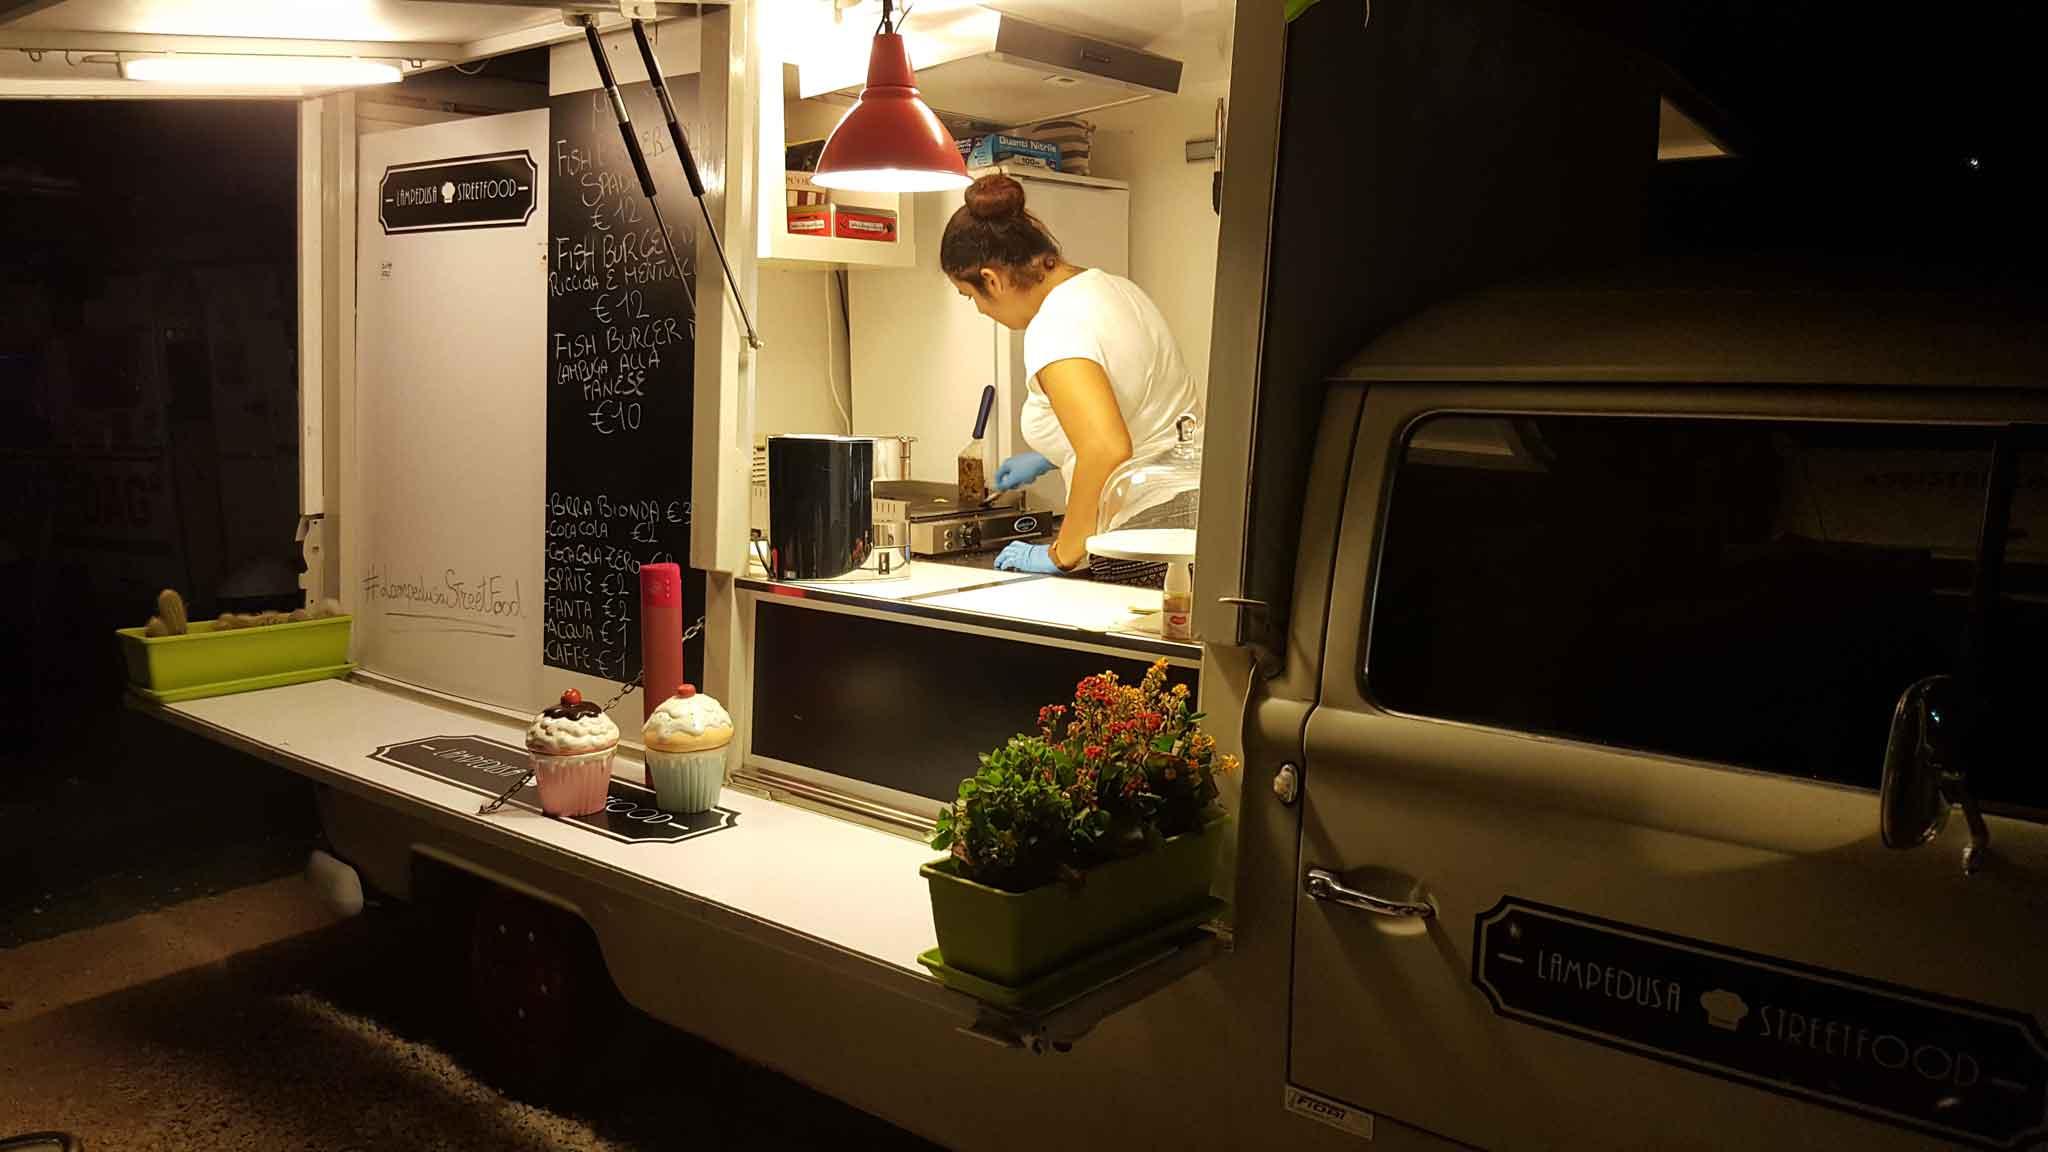 lampedusa-truck-street-food